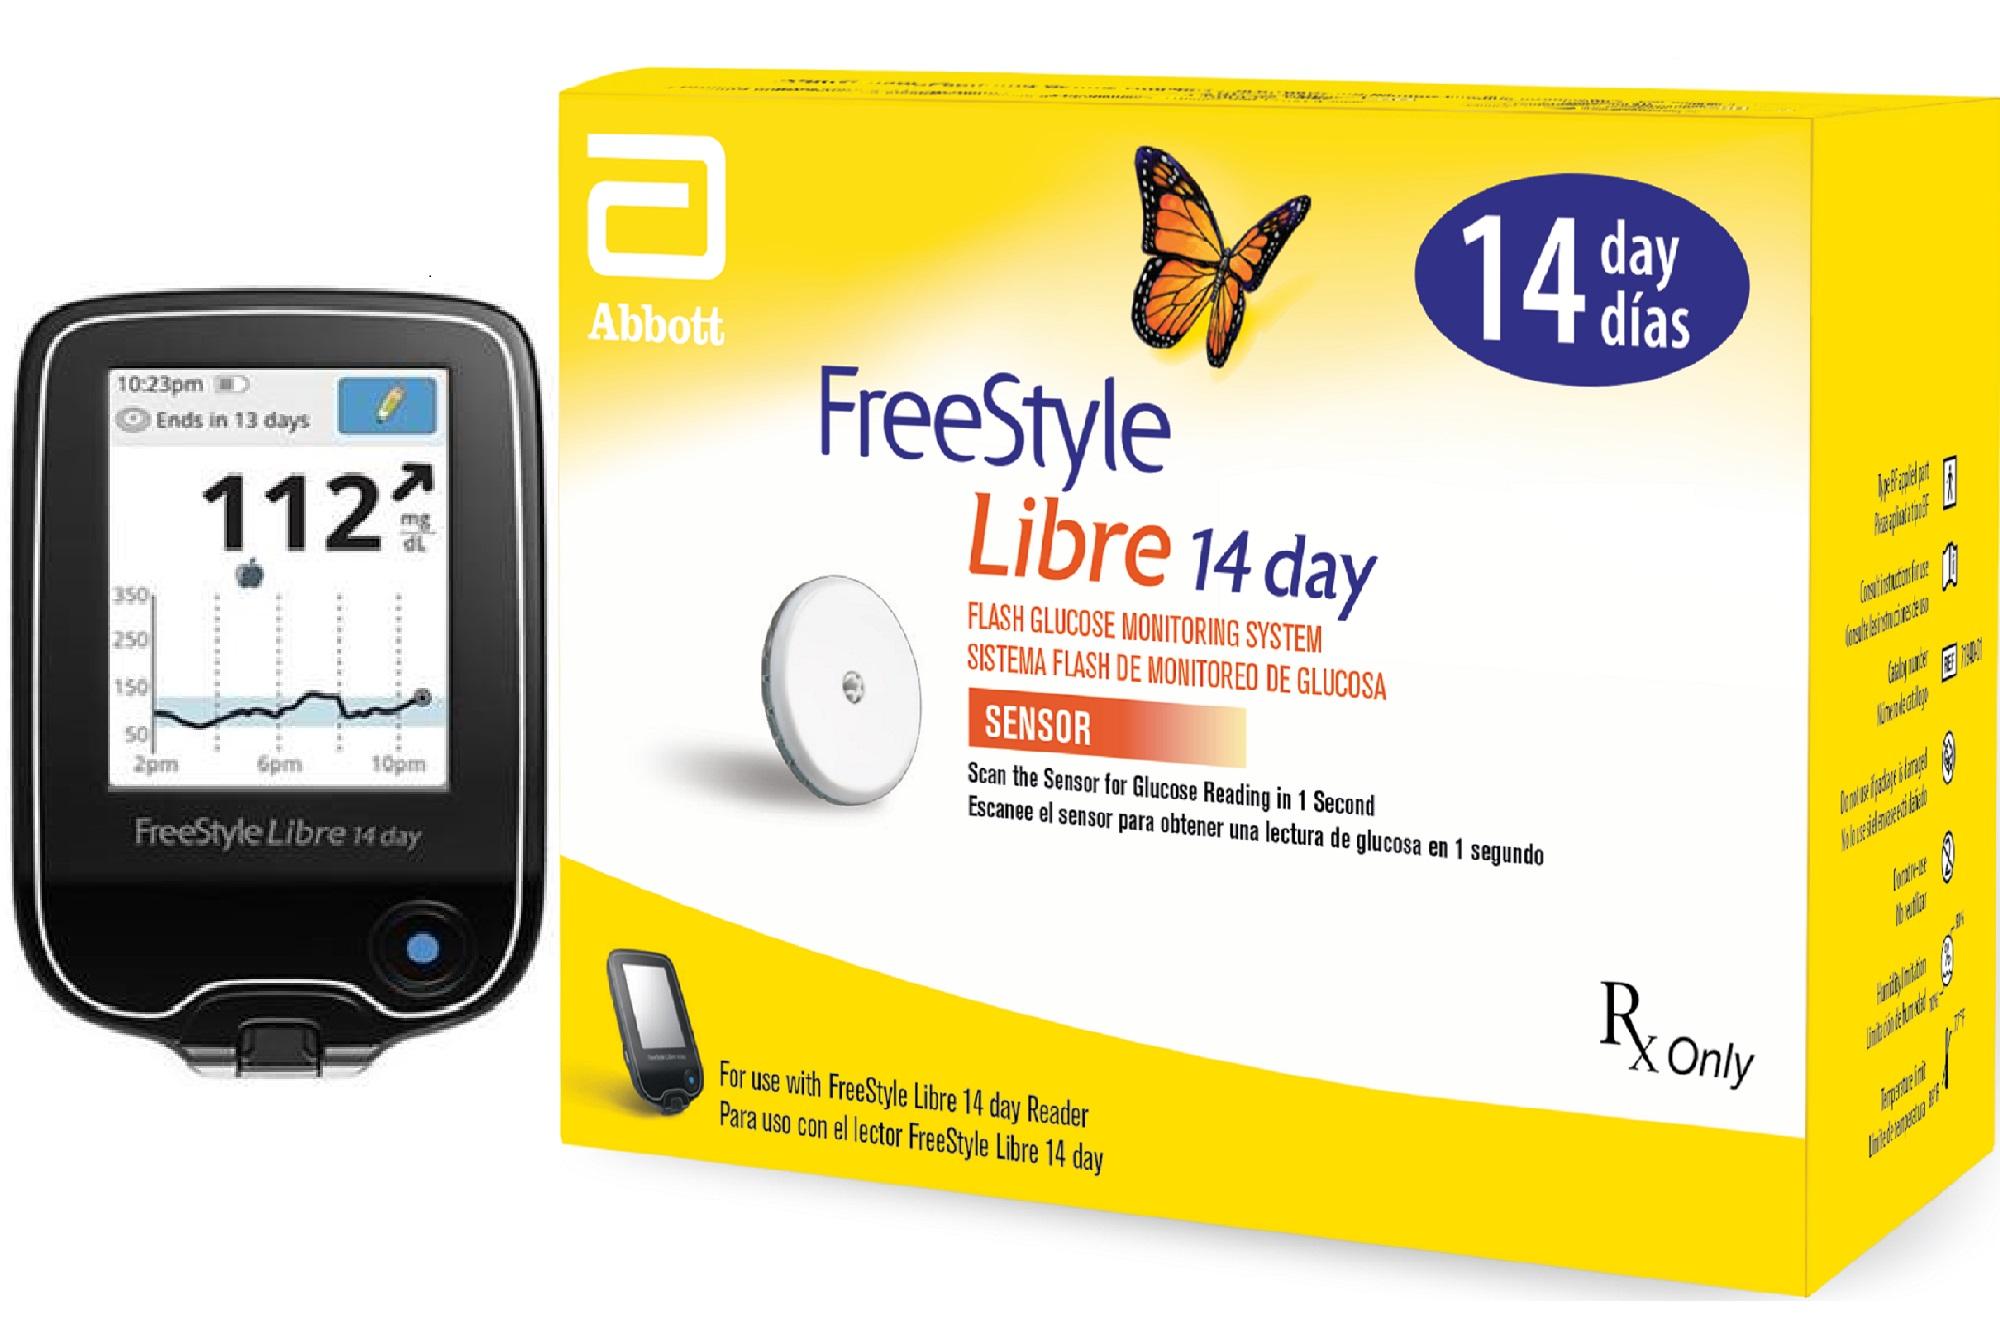 Freestyle Libre for Abbott